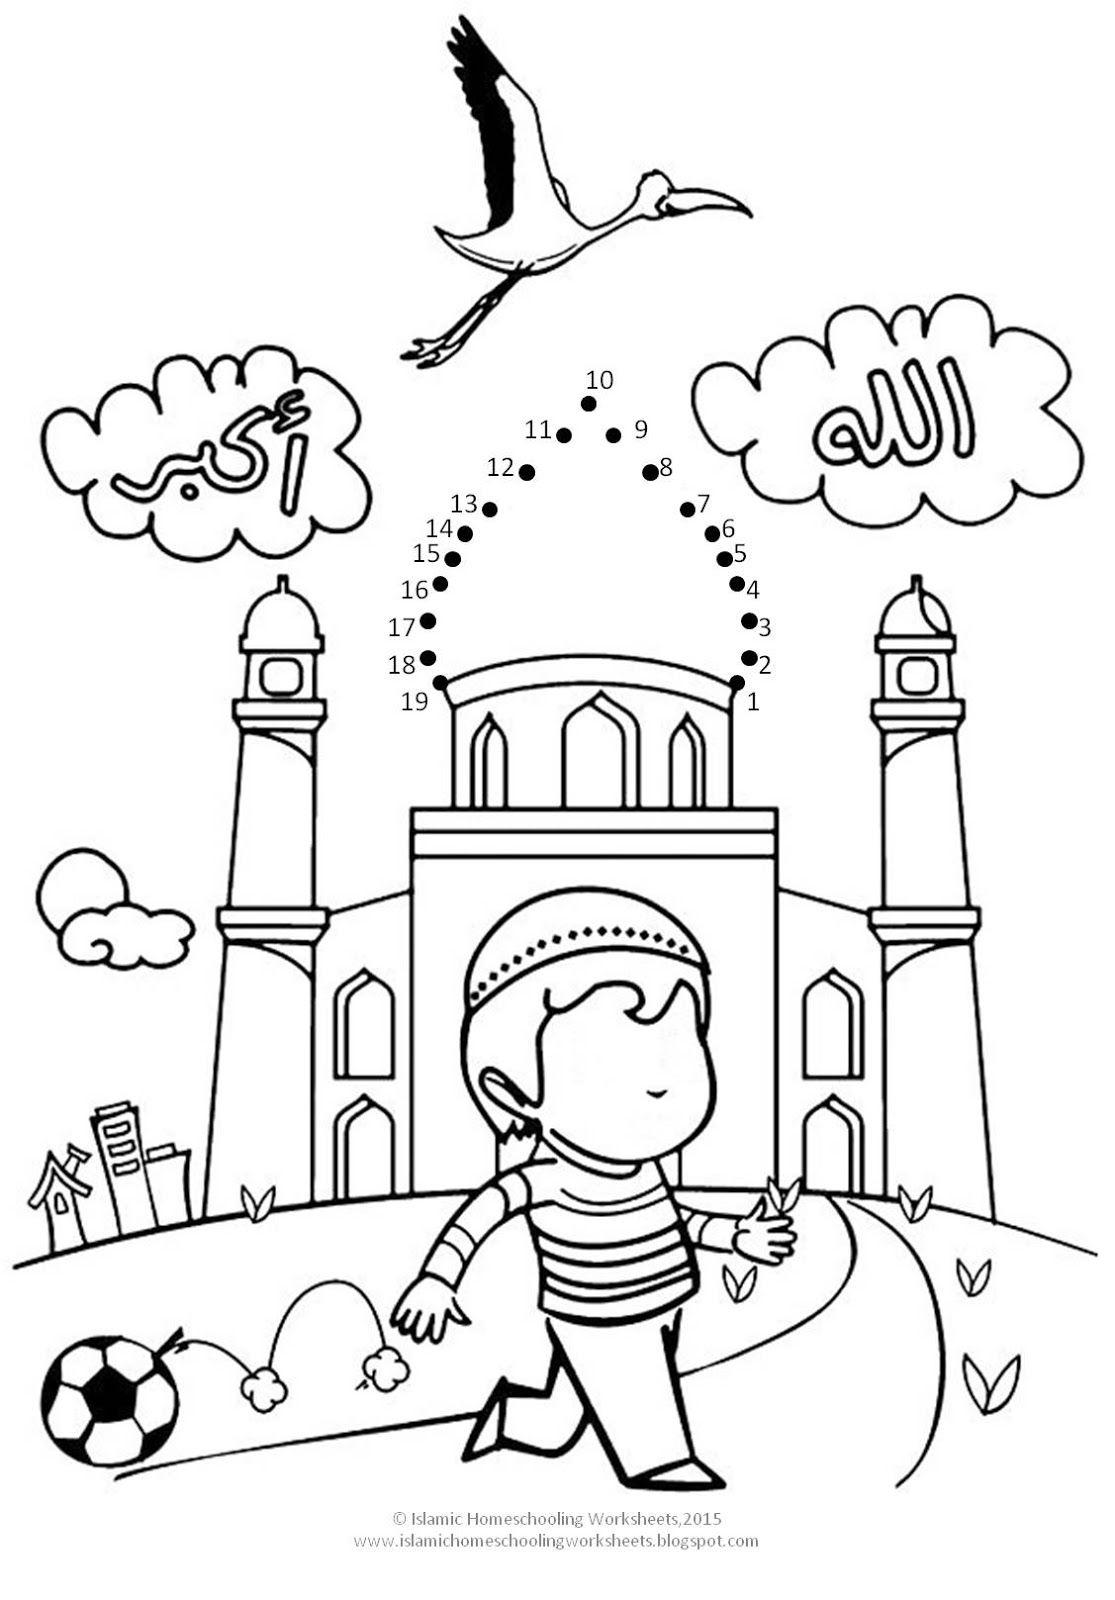 Islamic Homeschooling ramadan